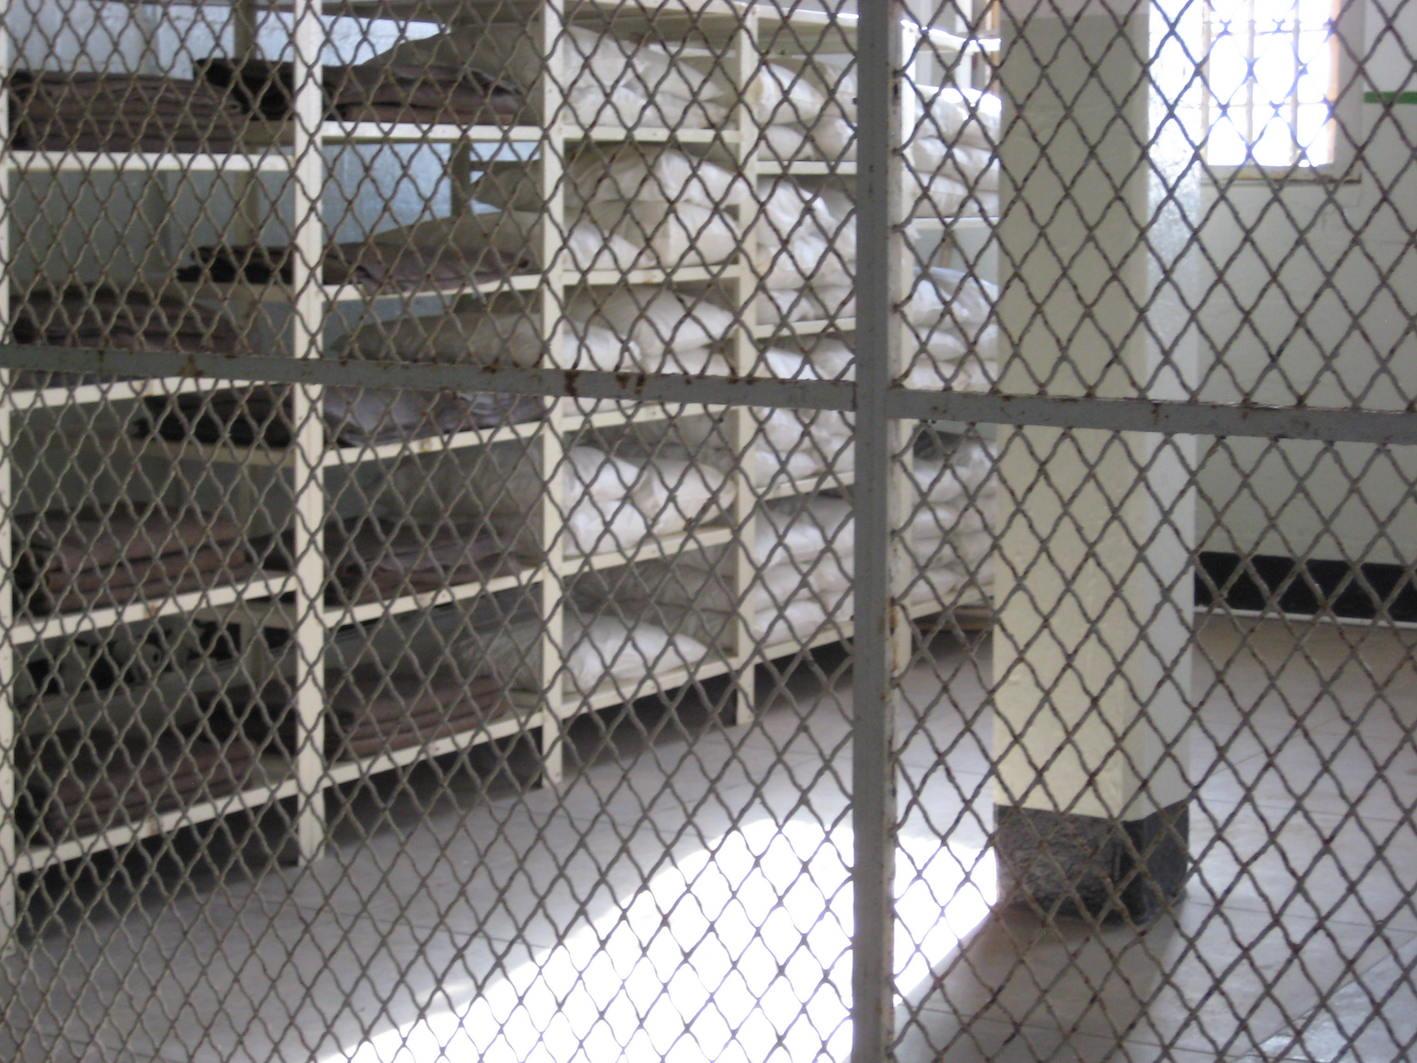 Mon royaume - Ma prison - LSL 2011